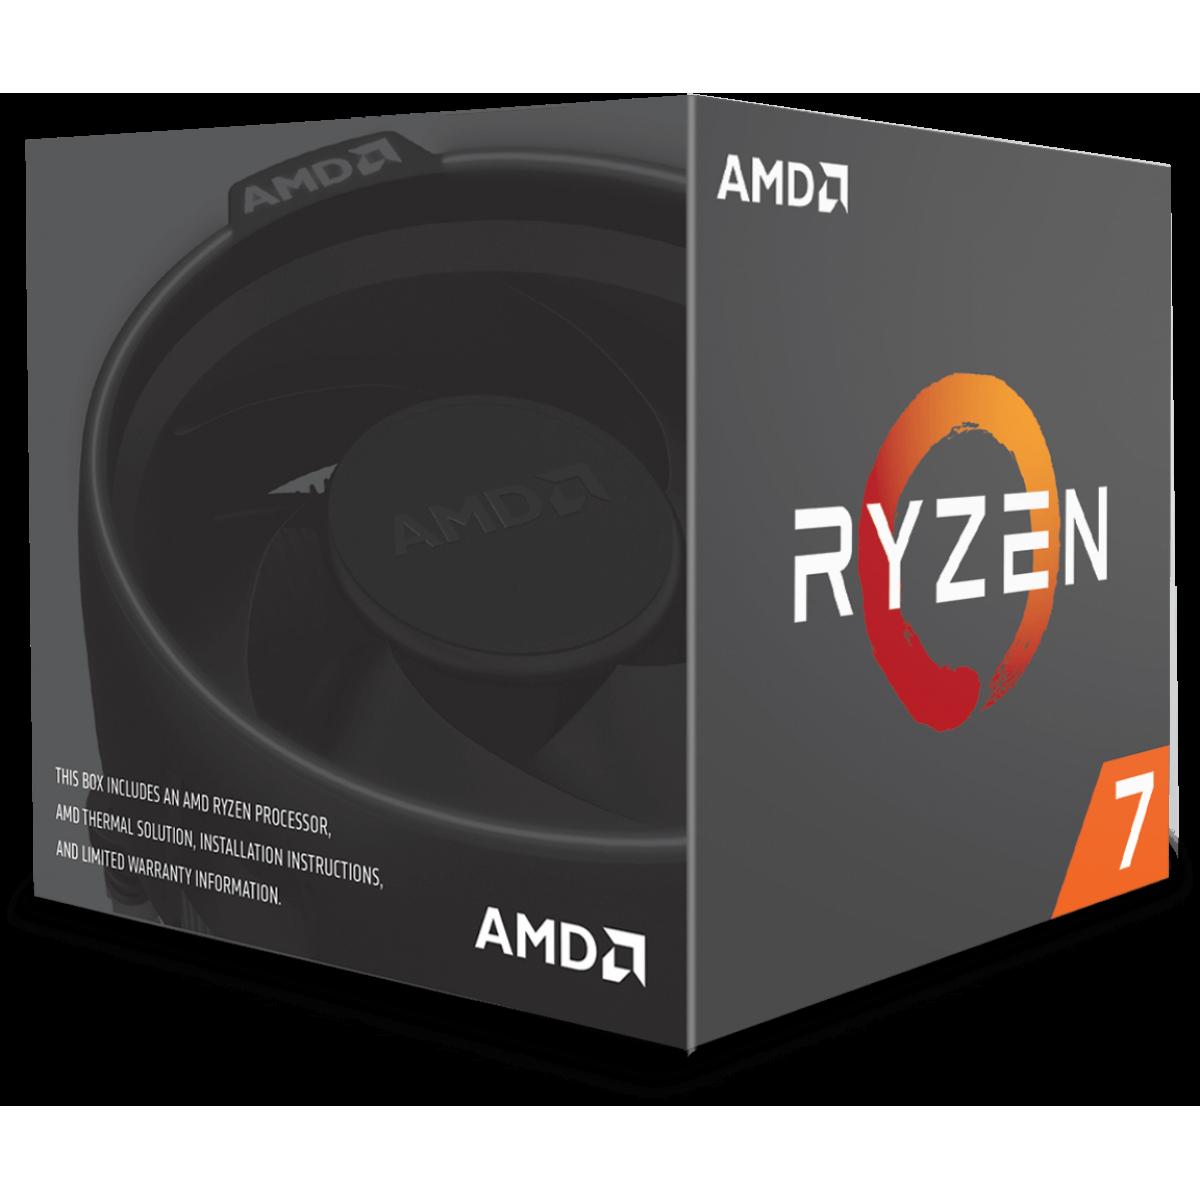 Processador AMD Ryzen 7 2700 3.2GHz (4.1GHz Turbo), 8-Cores 16-Threads, Cooler Wraith Spire com LED, AM4, YD2700BBAFBOX, S/ Video